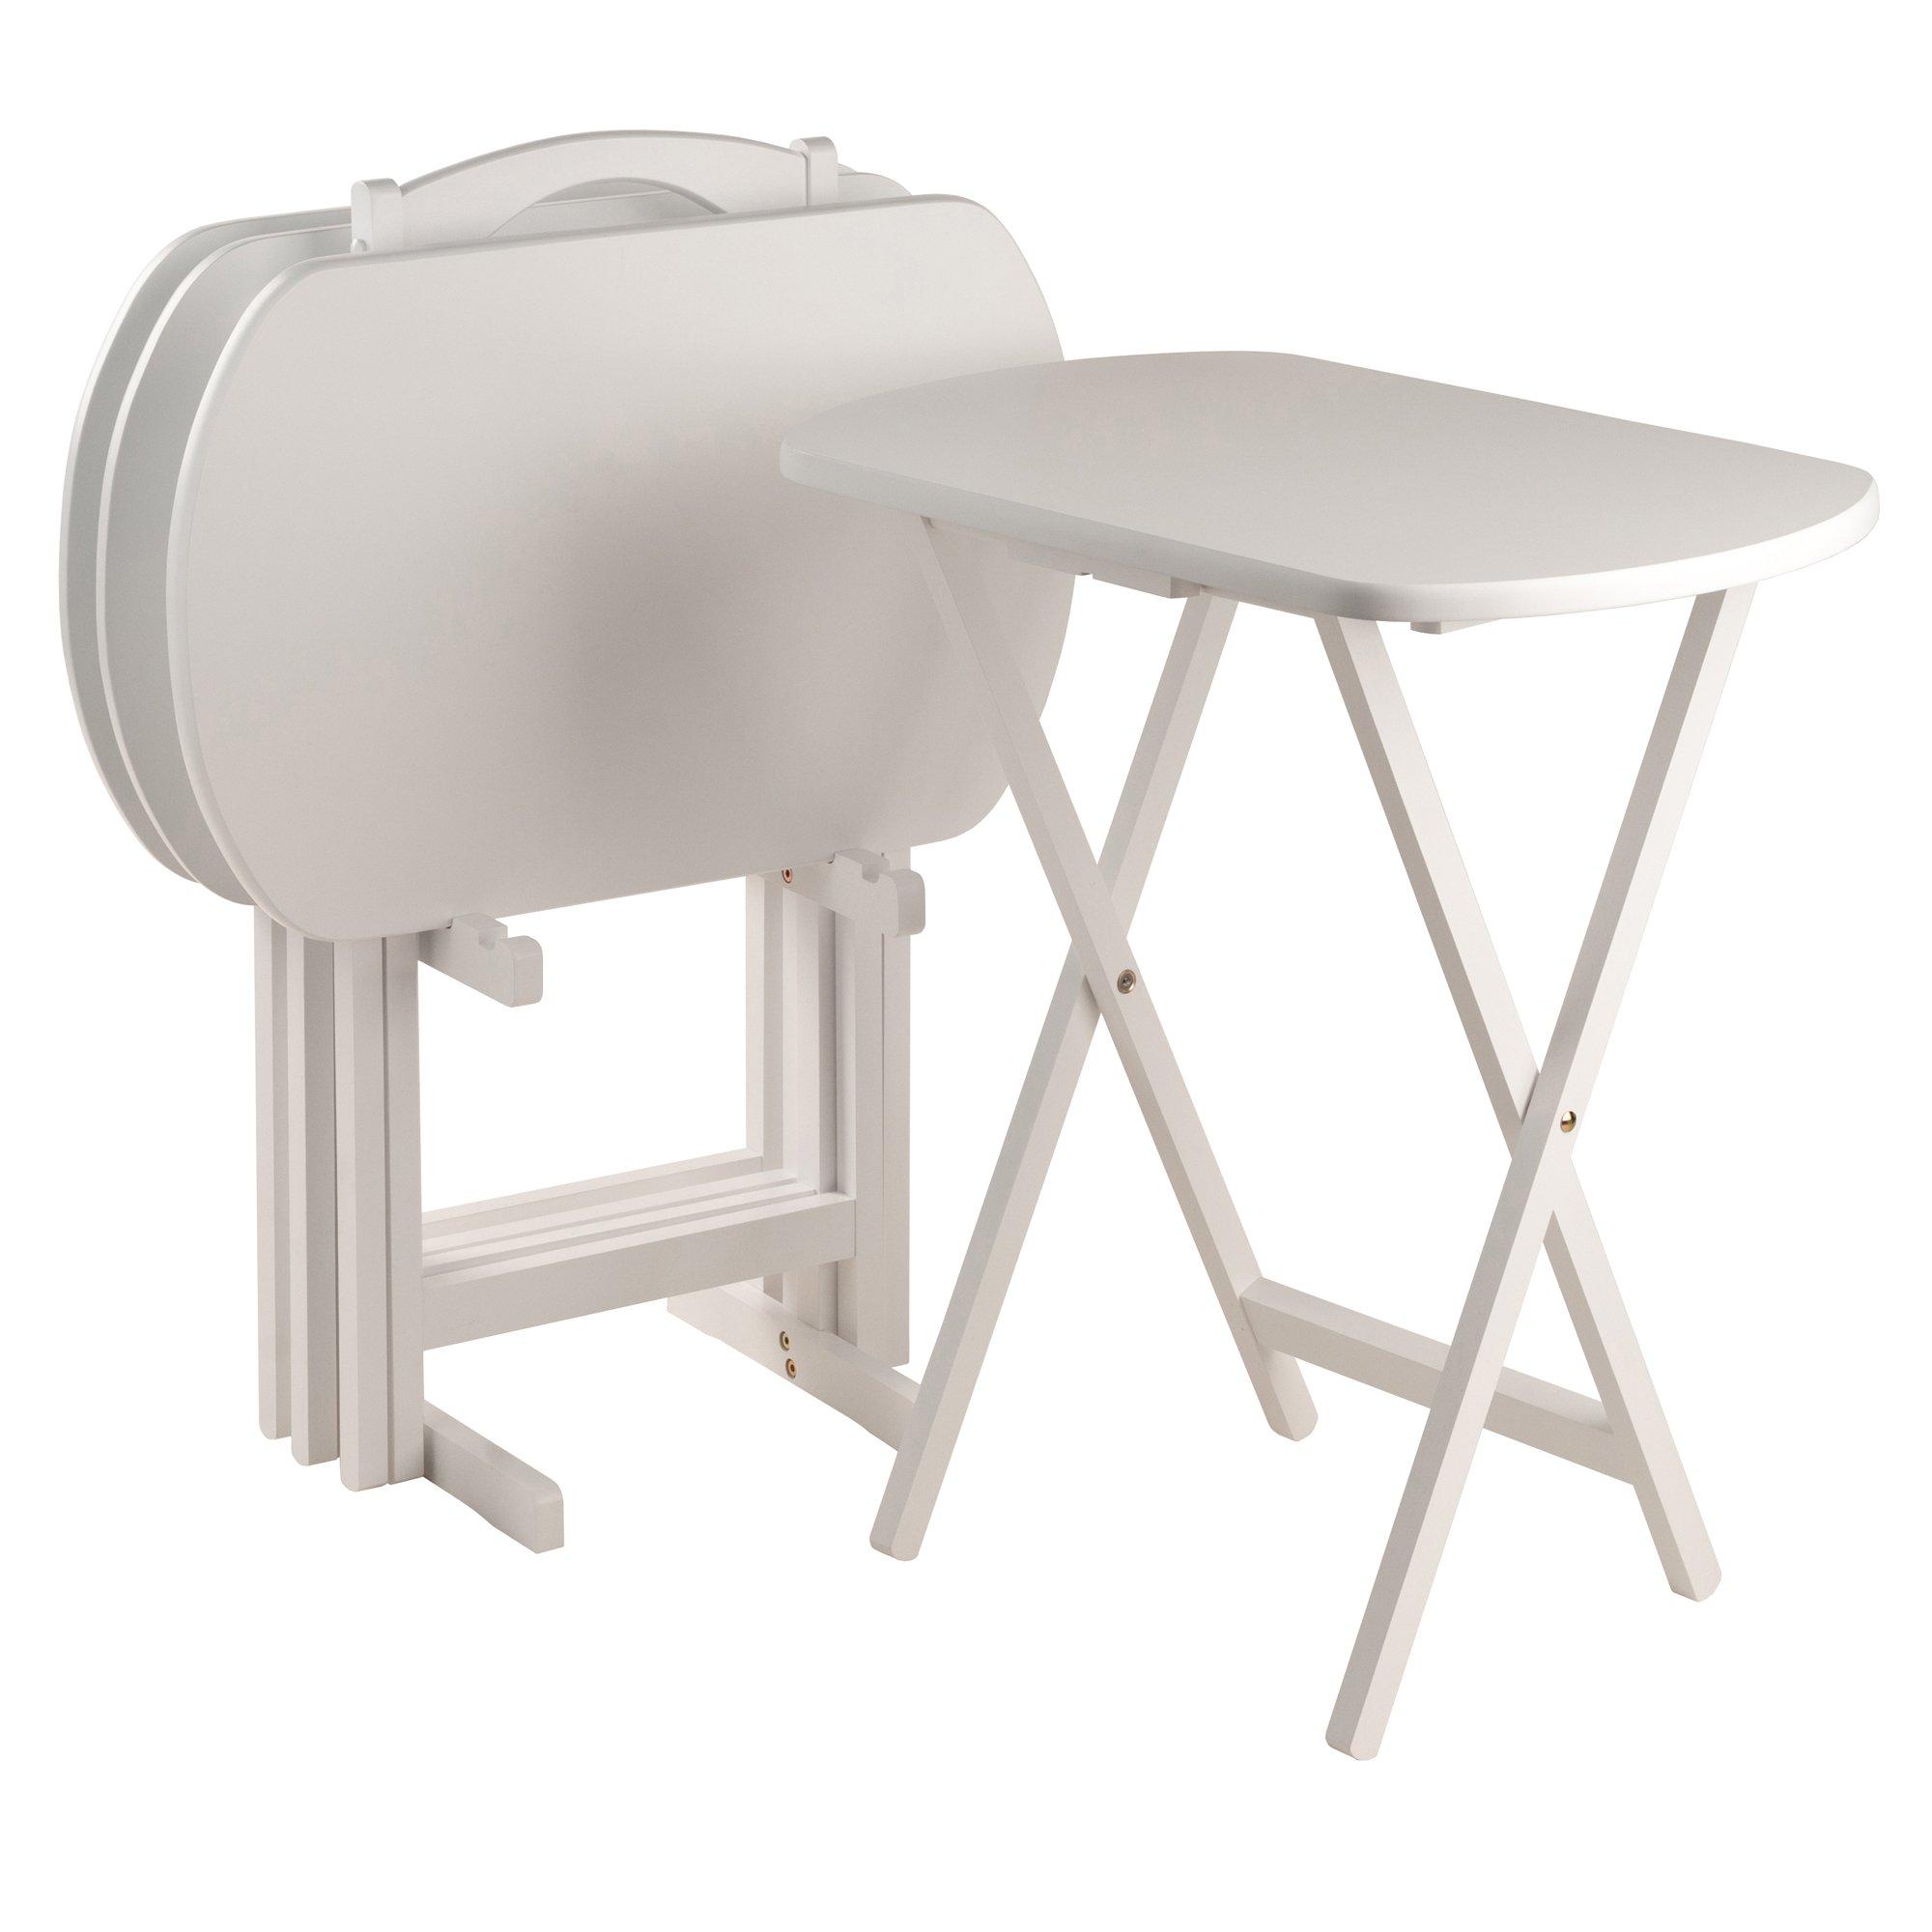 Winsome Corbett 5-Piece Oblong Portable Snack Tray Table, White